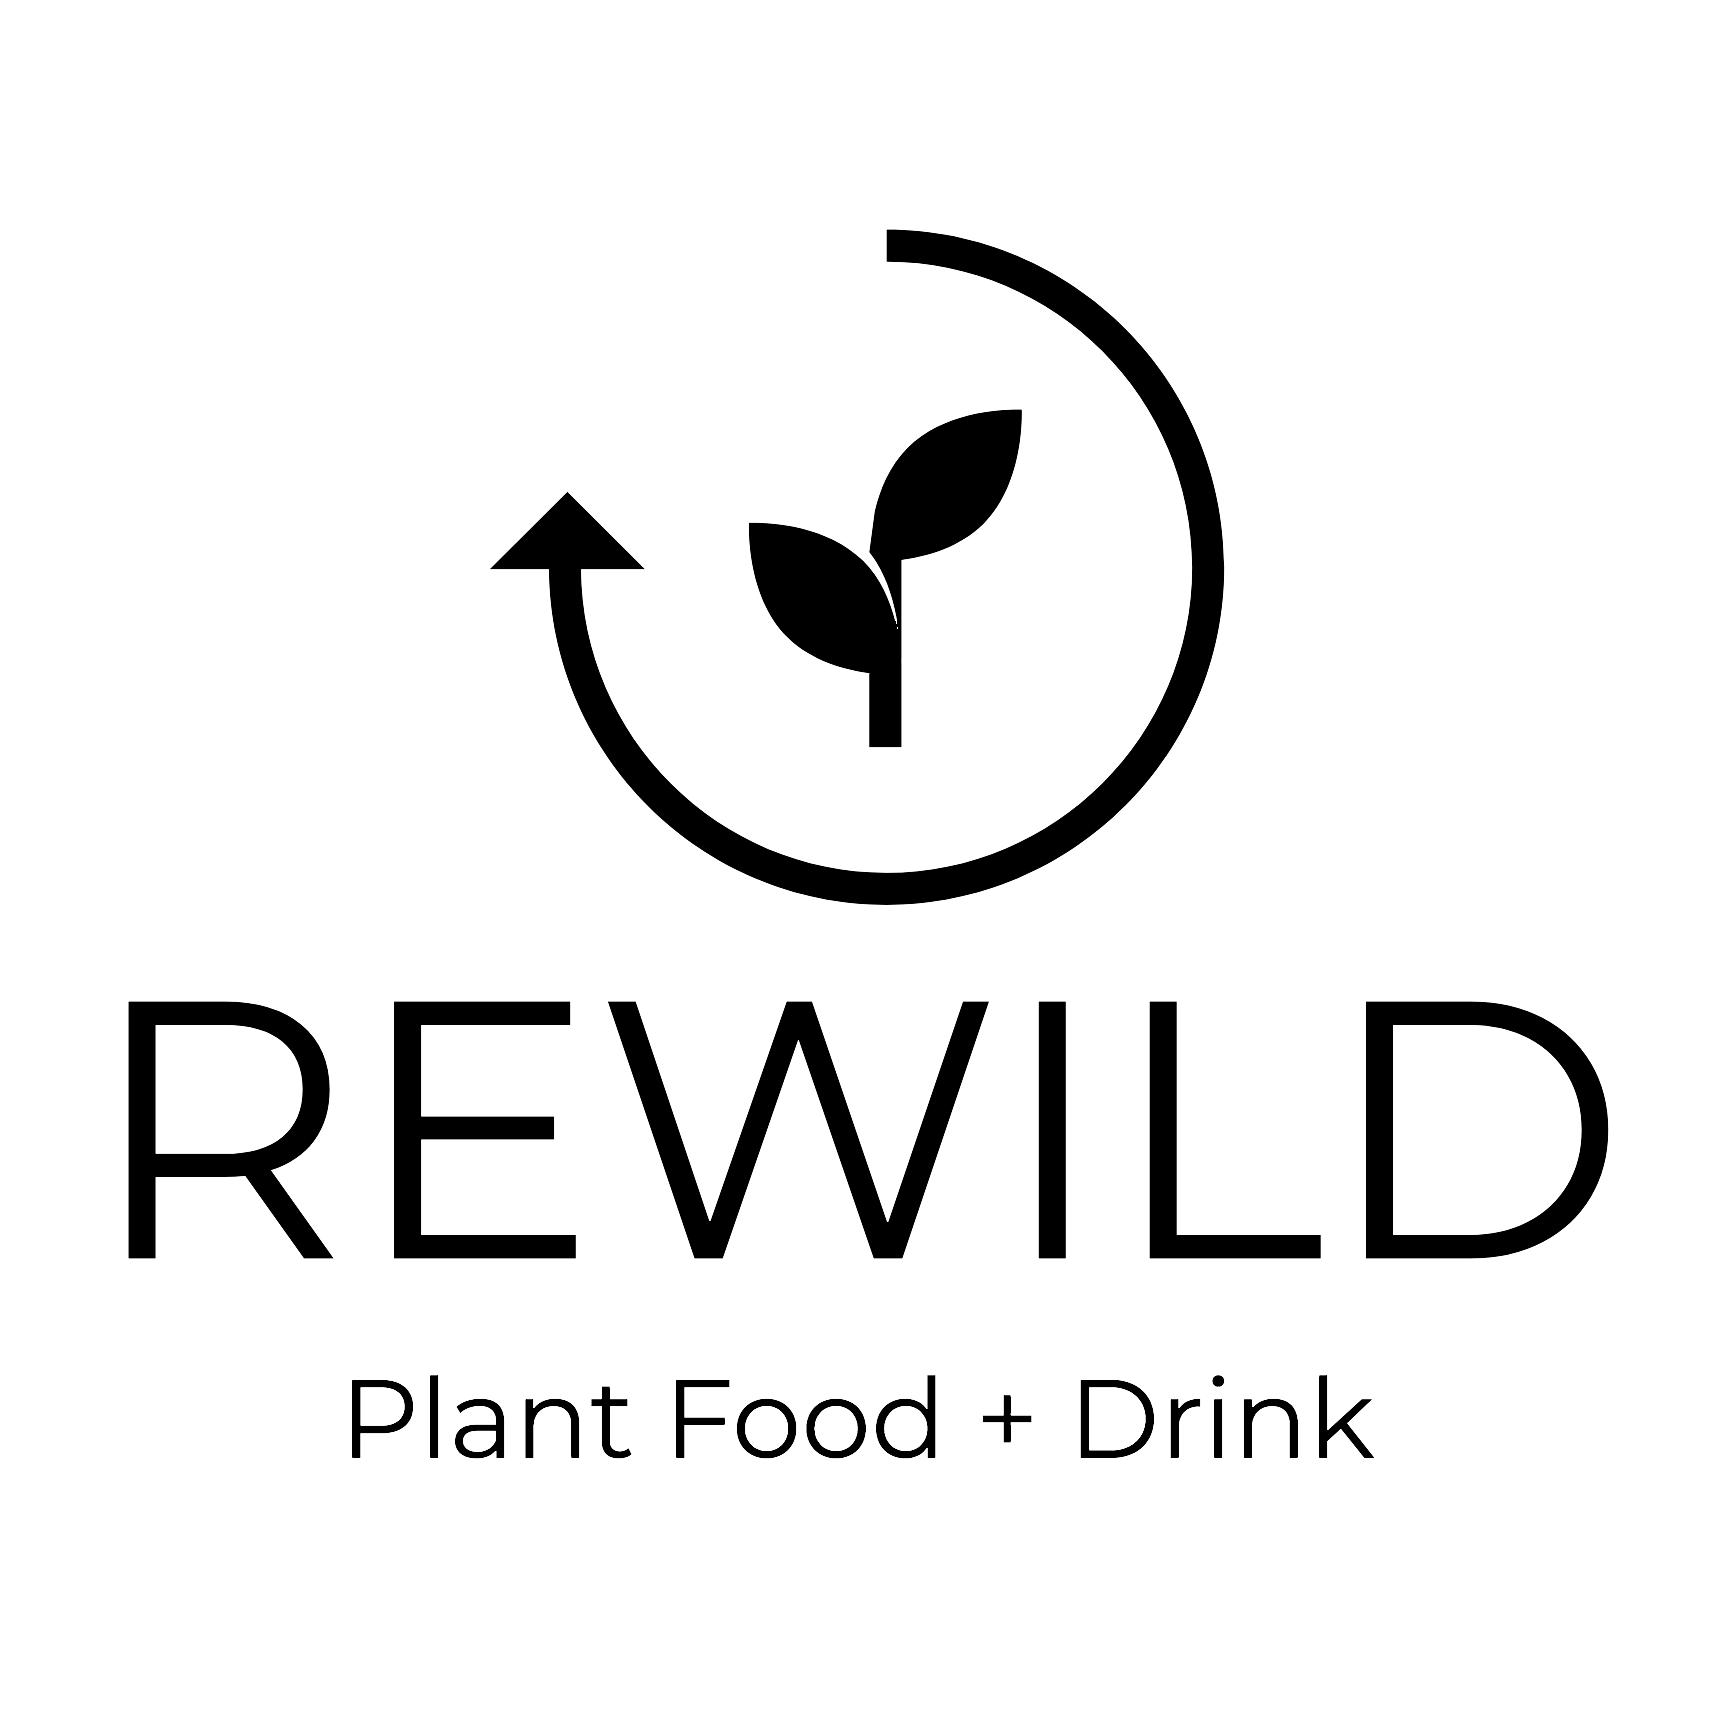 REWILD-logo square.png